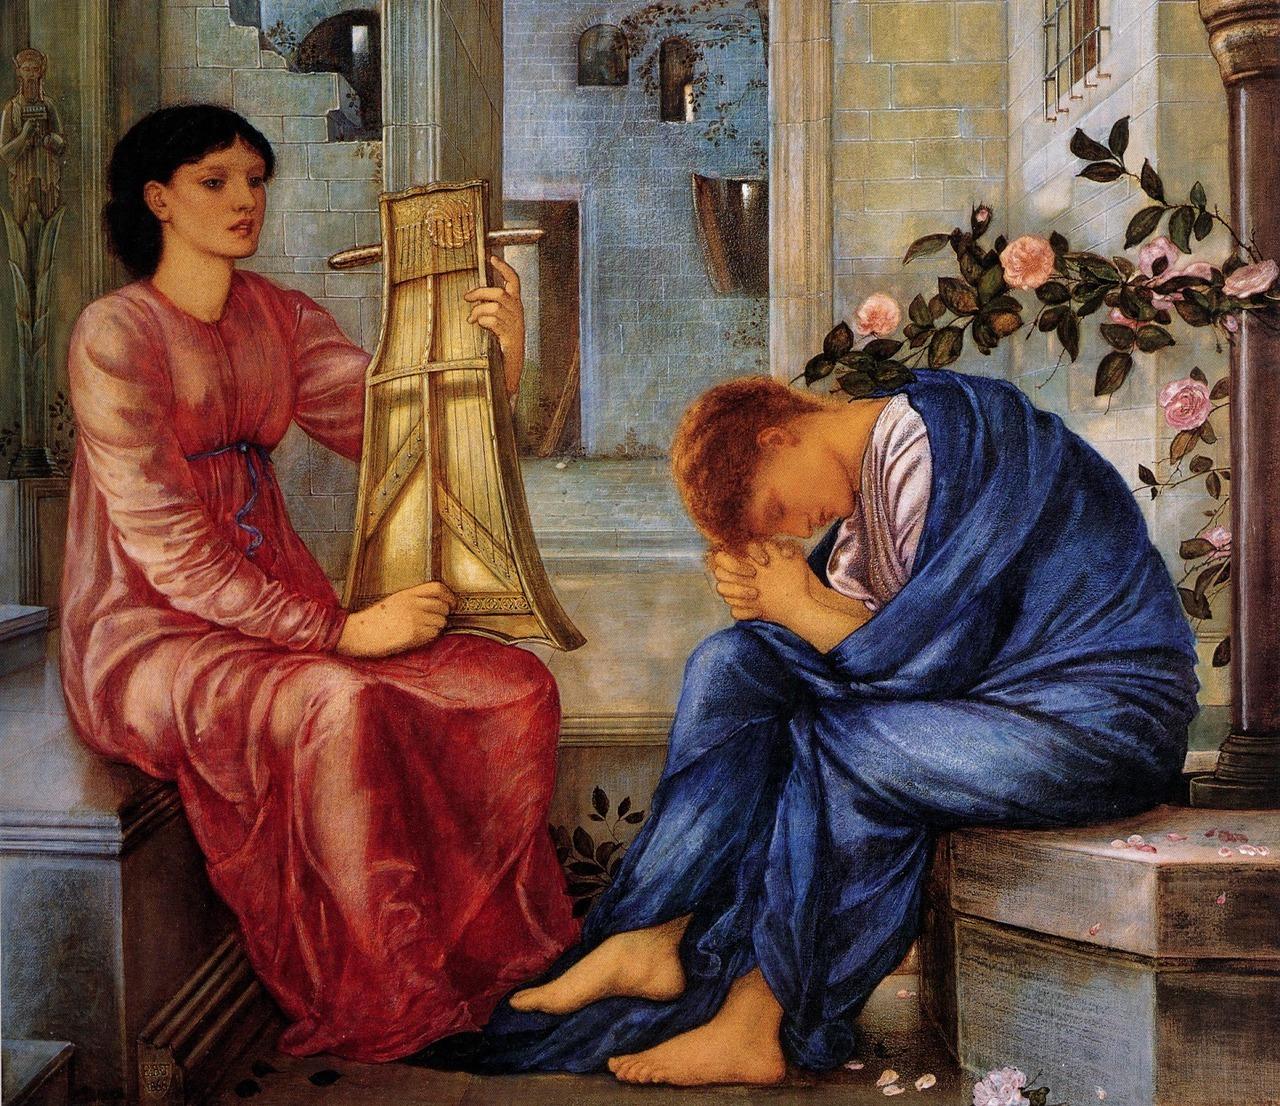 Art — Edward Burne-Jones - The Lament 1866